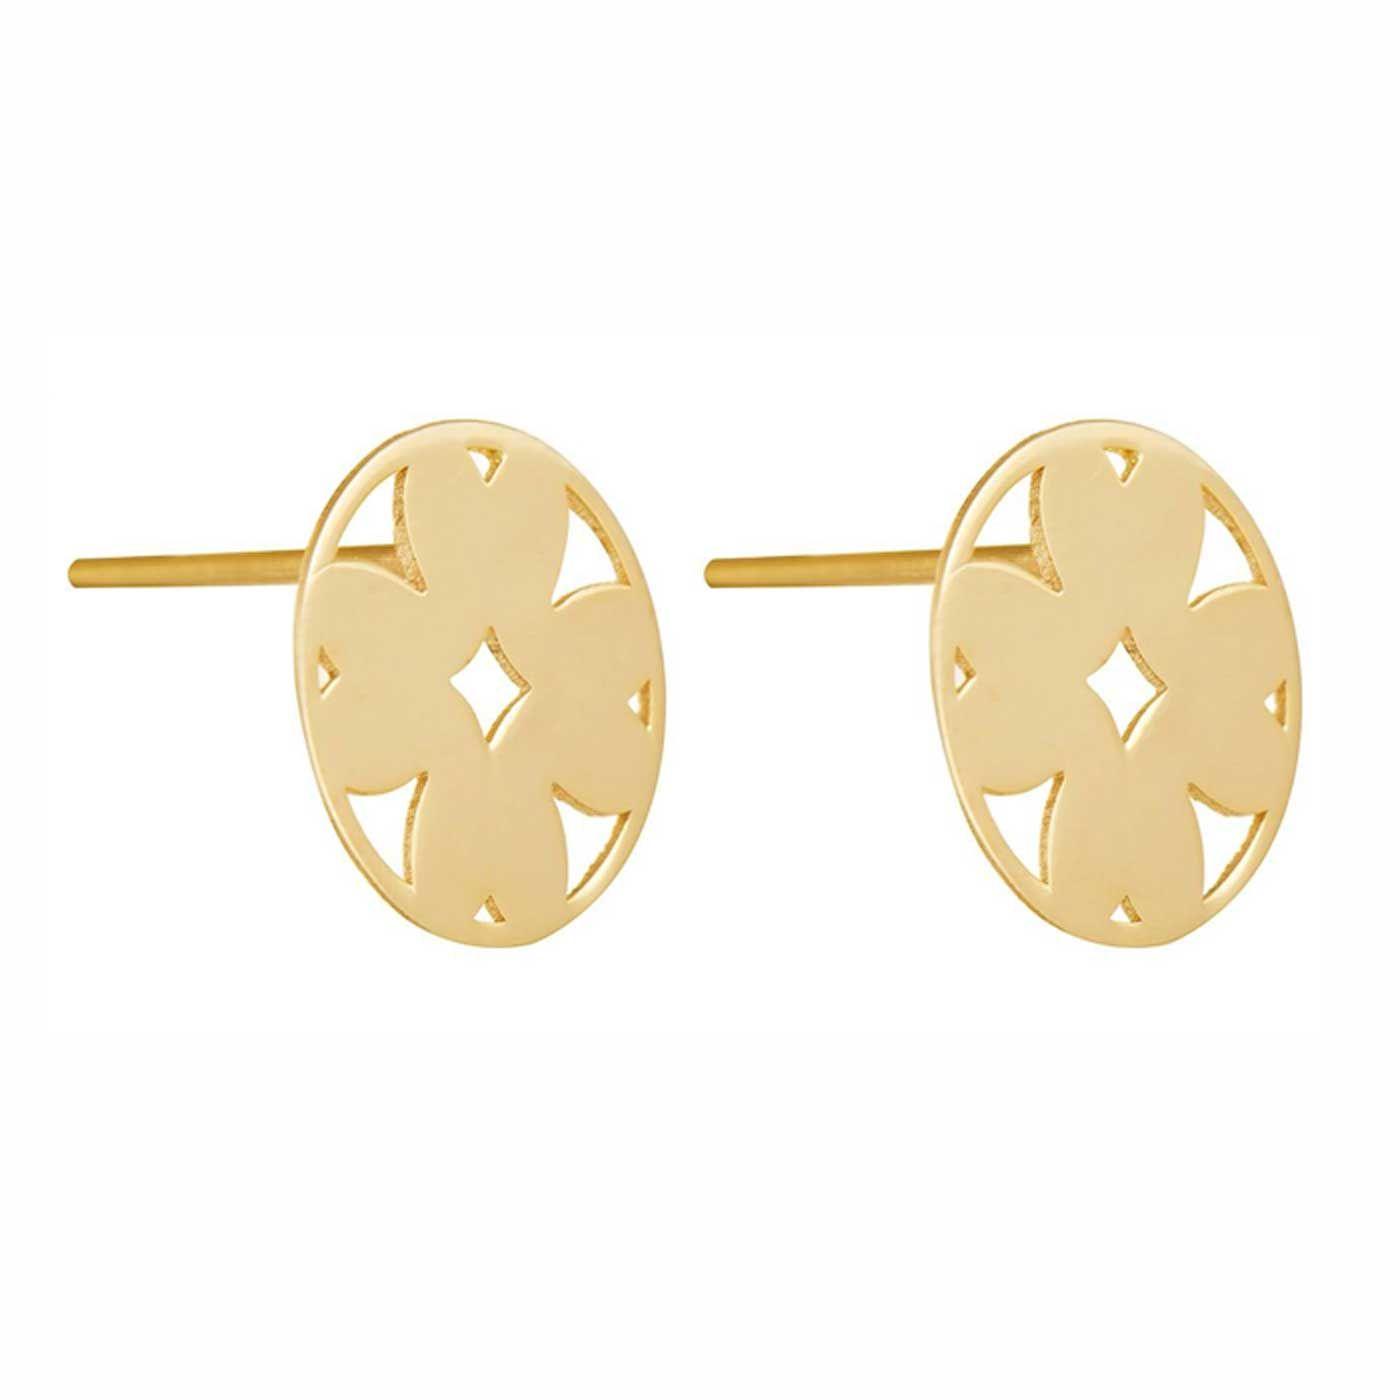 گوشواره طلا 18 عیار زنانه کانیار گالری کد GOA114 -  - 4